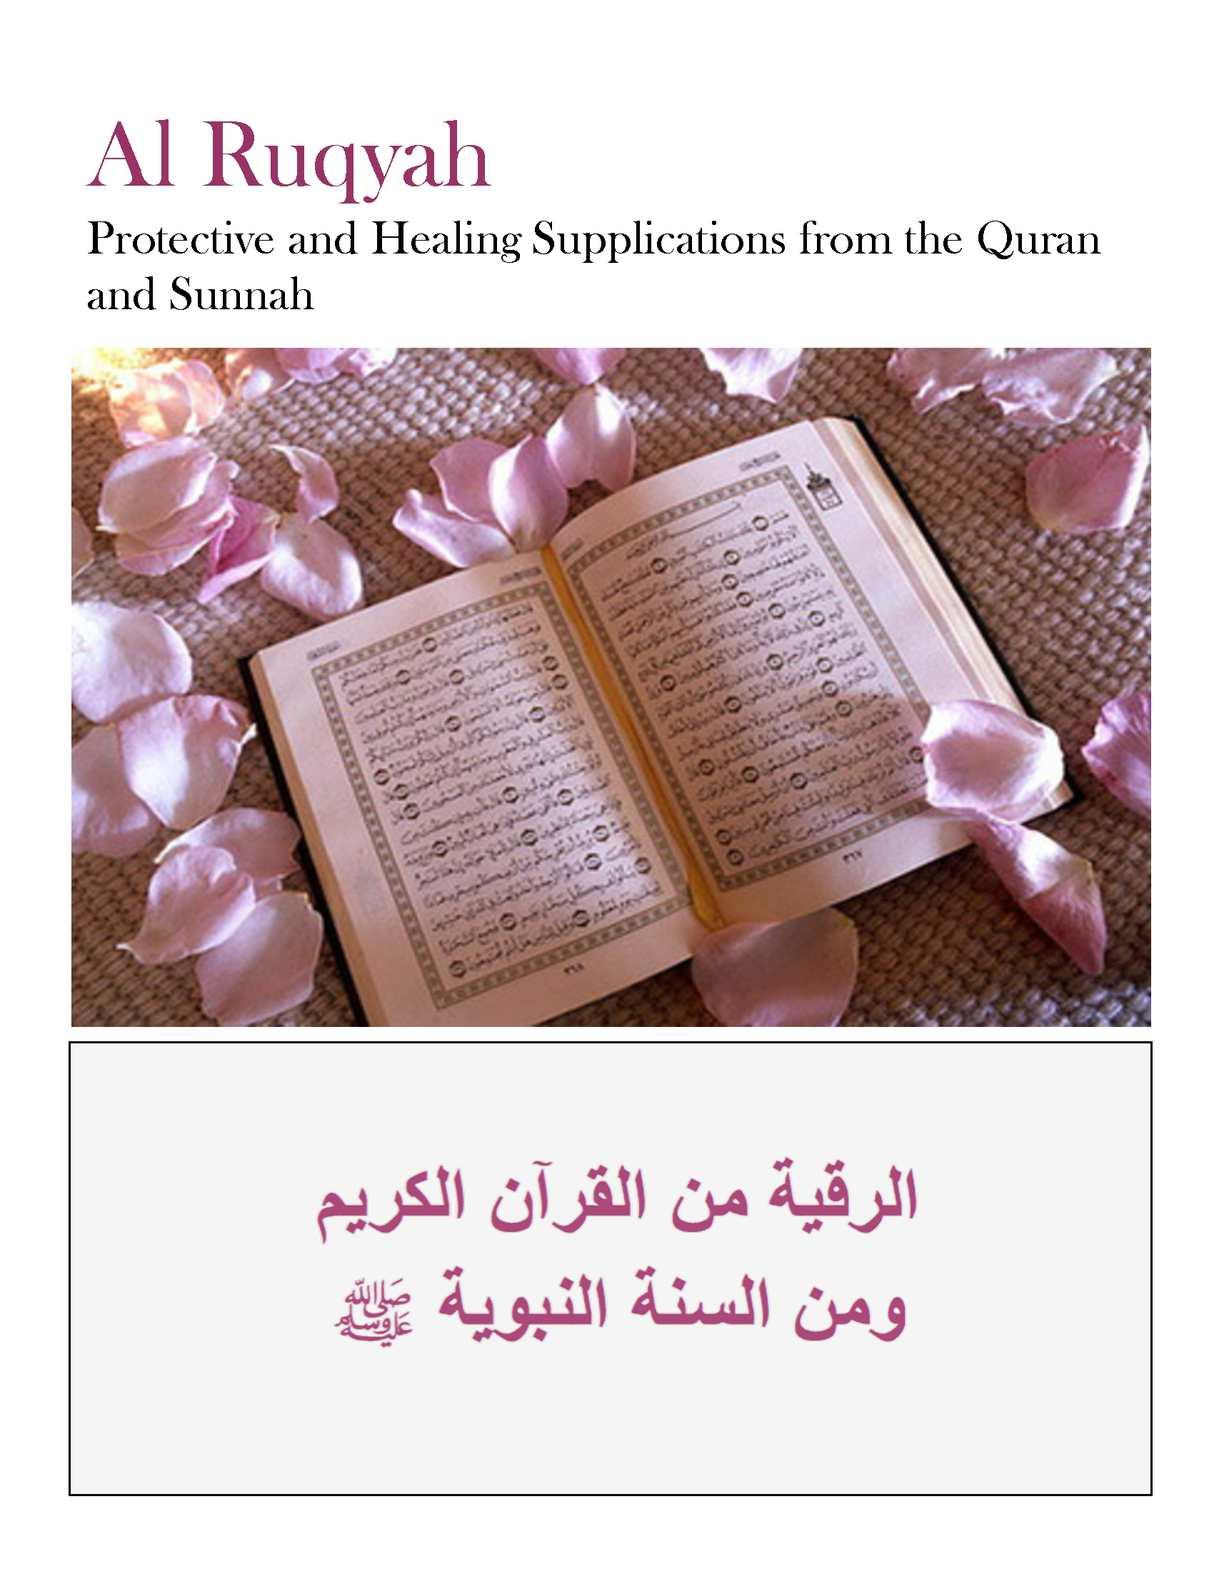 Calaméo - Al Ruqyah - Protective and Healing Supplications